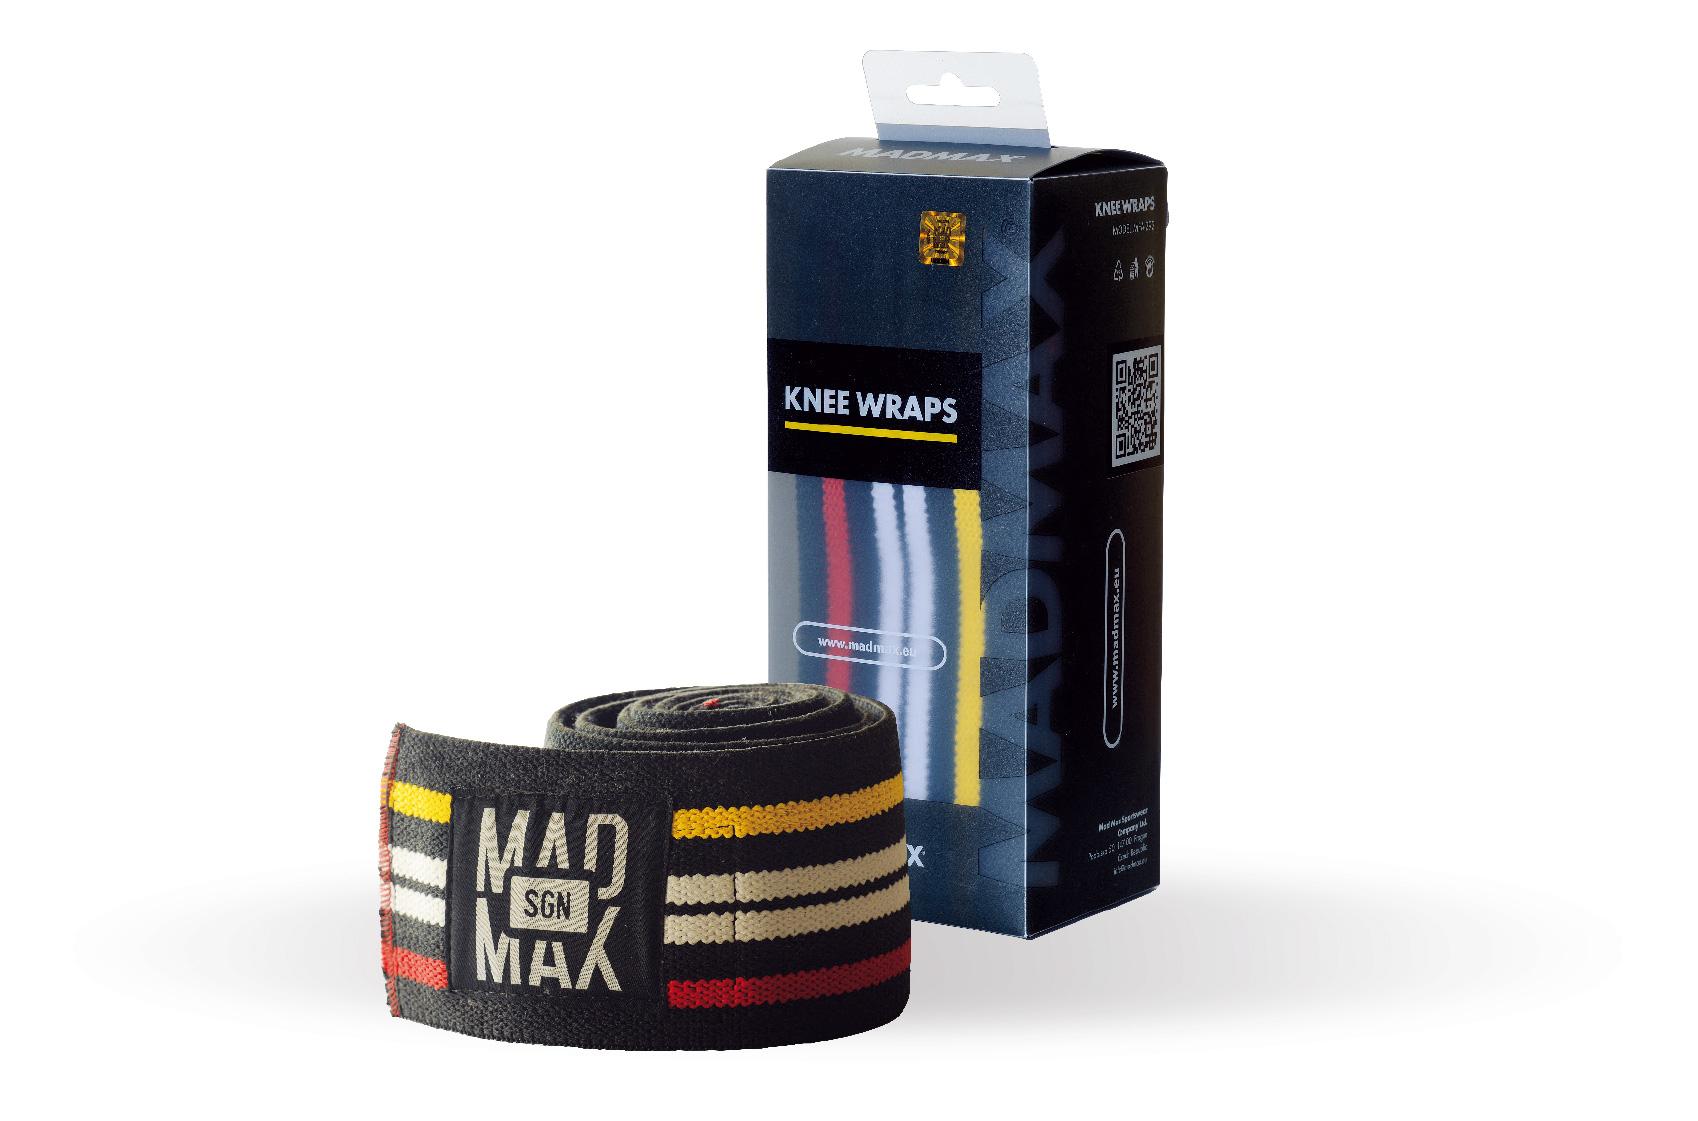 MAD MAX MFA-292 knee wraps